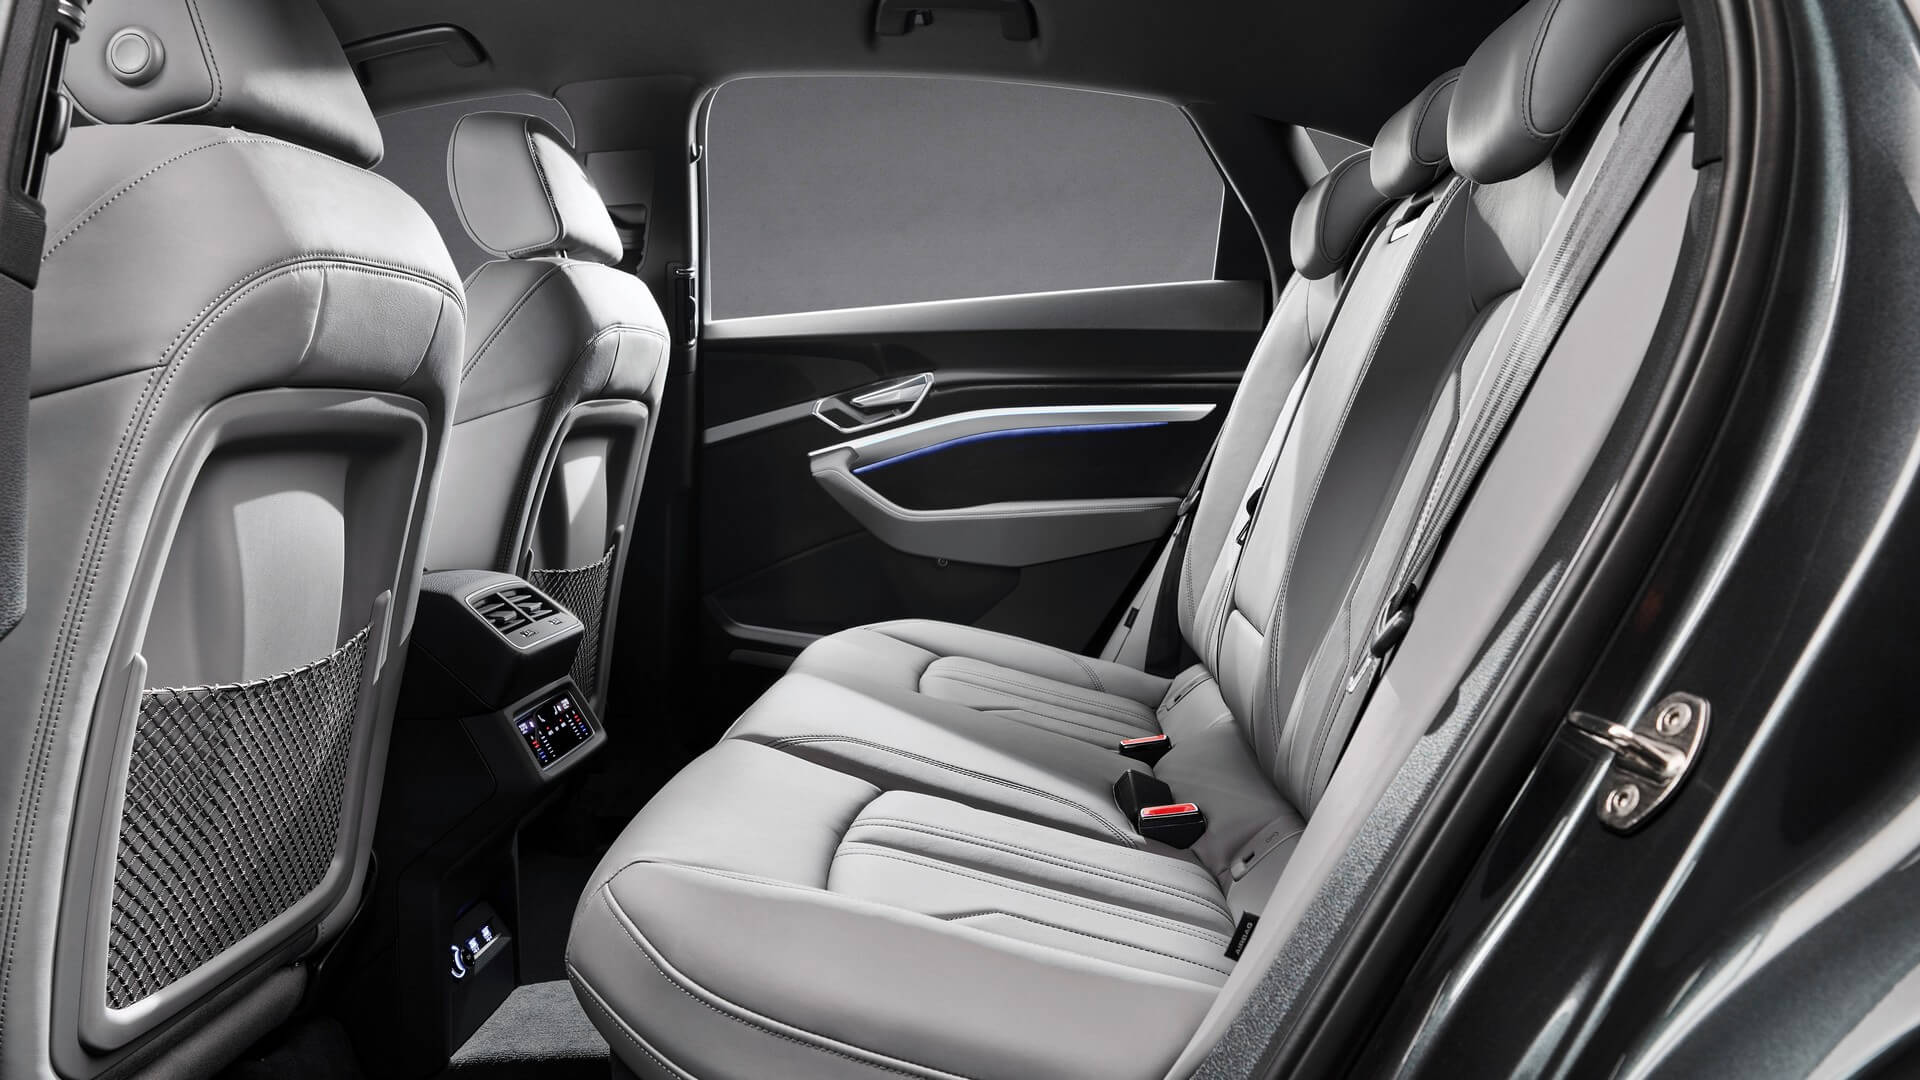 Audi-E-Tron-S-and-E-Tron-S-Sportback-2020-84